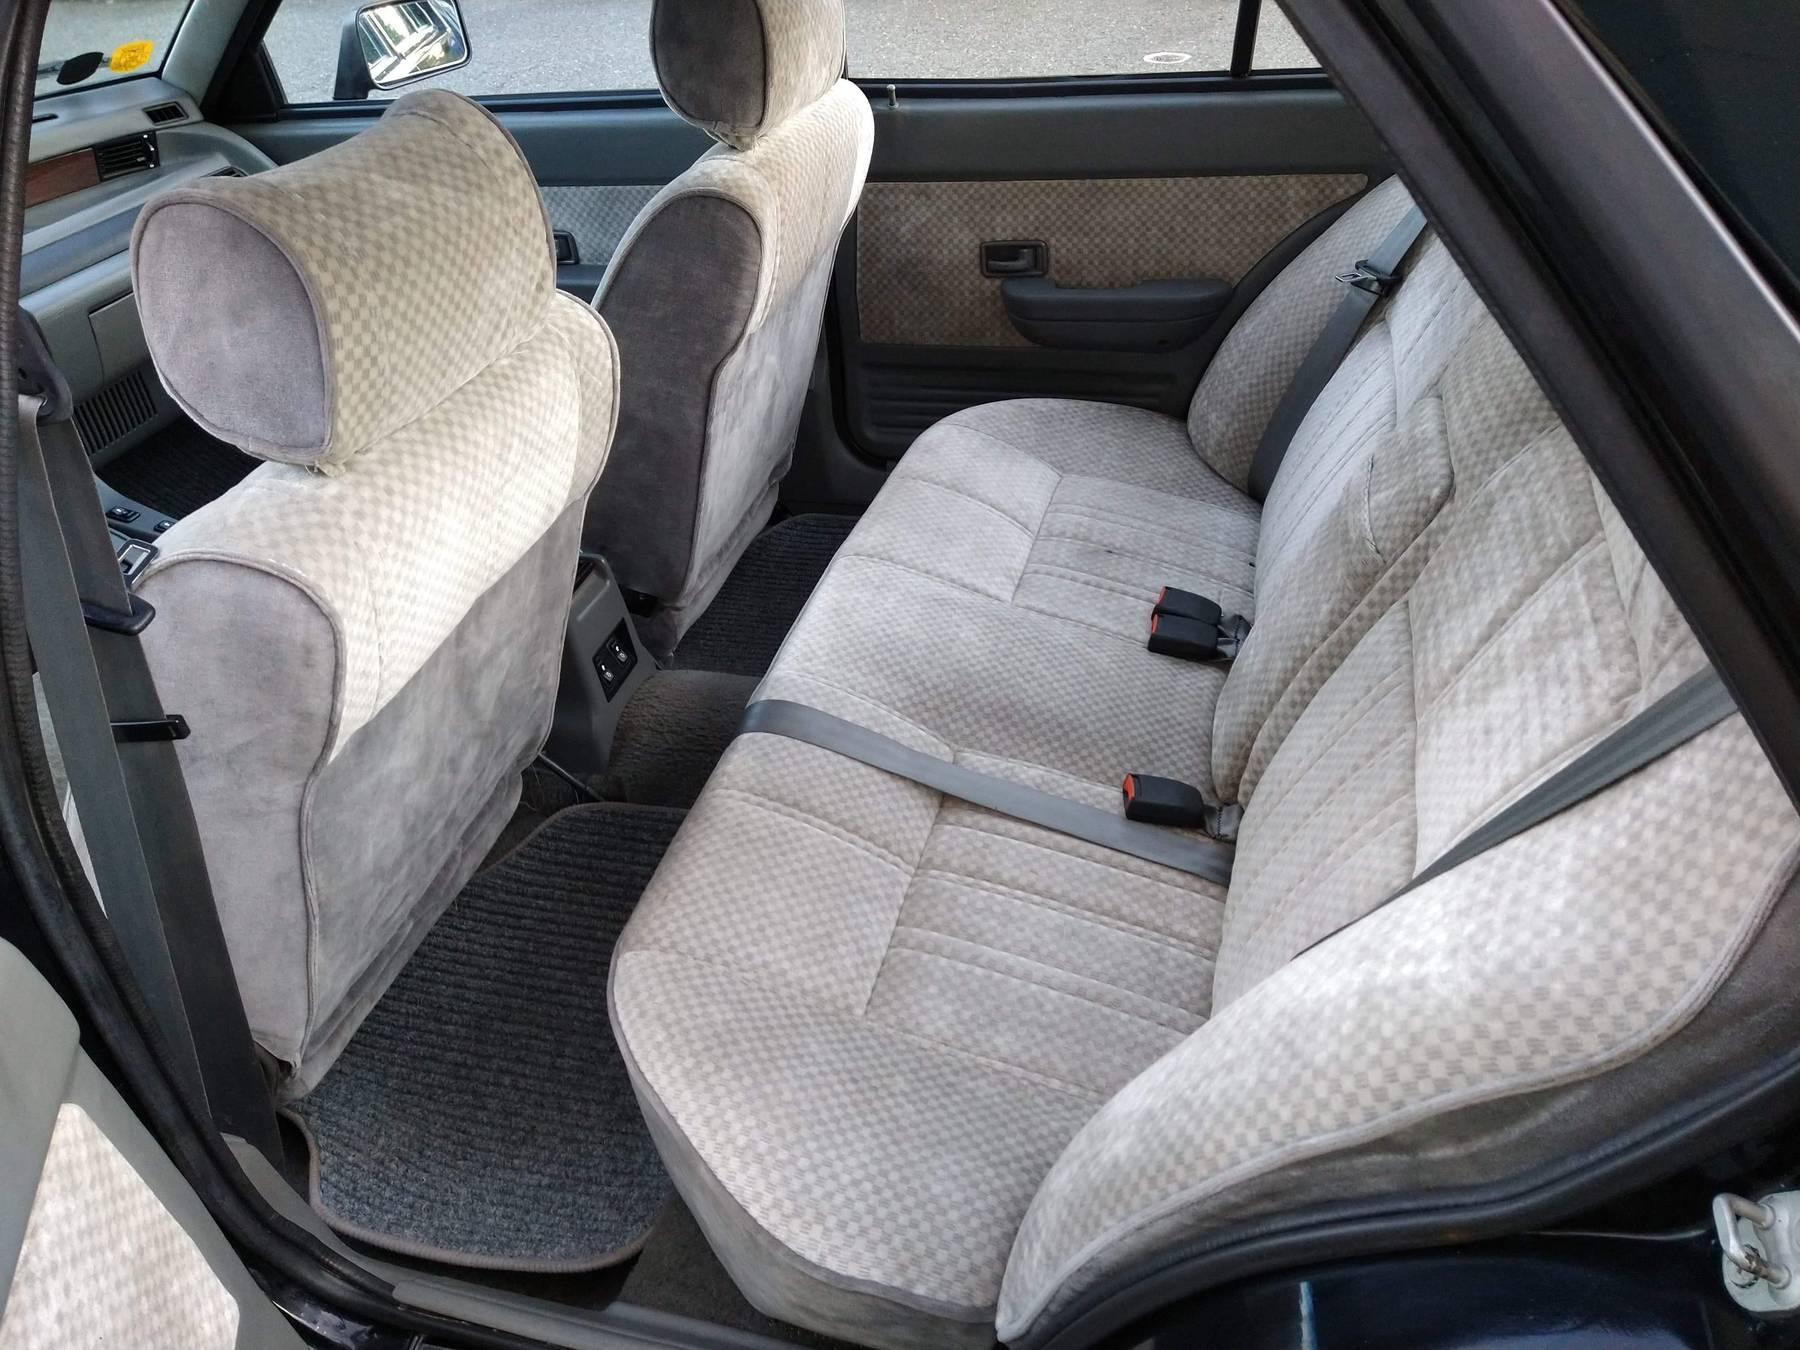 1986 Hyundai Stellar Executive rear seat